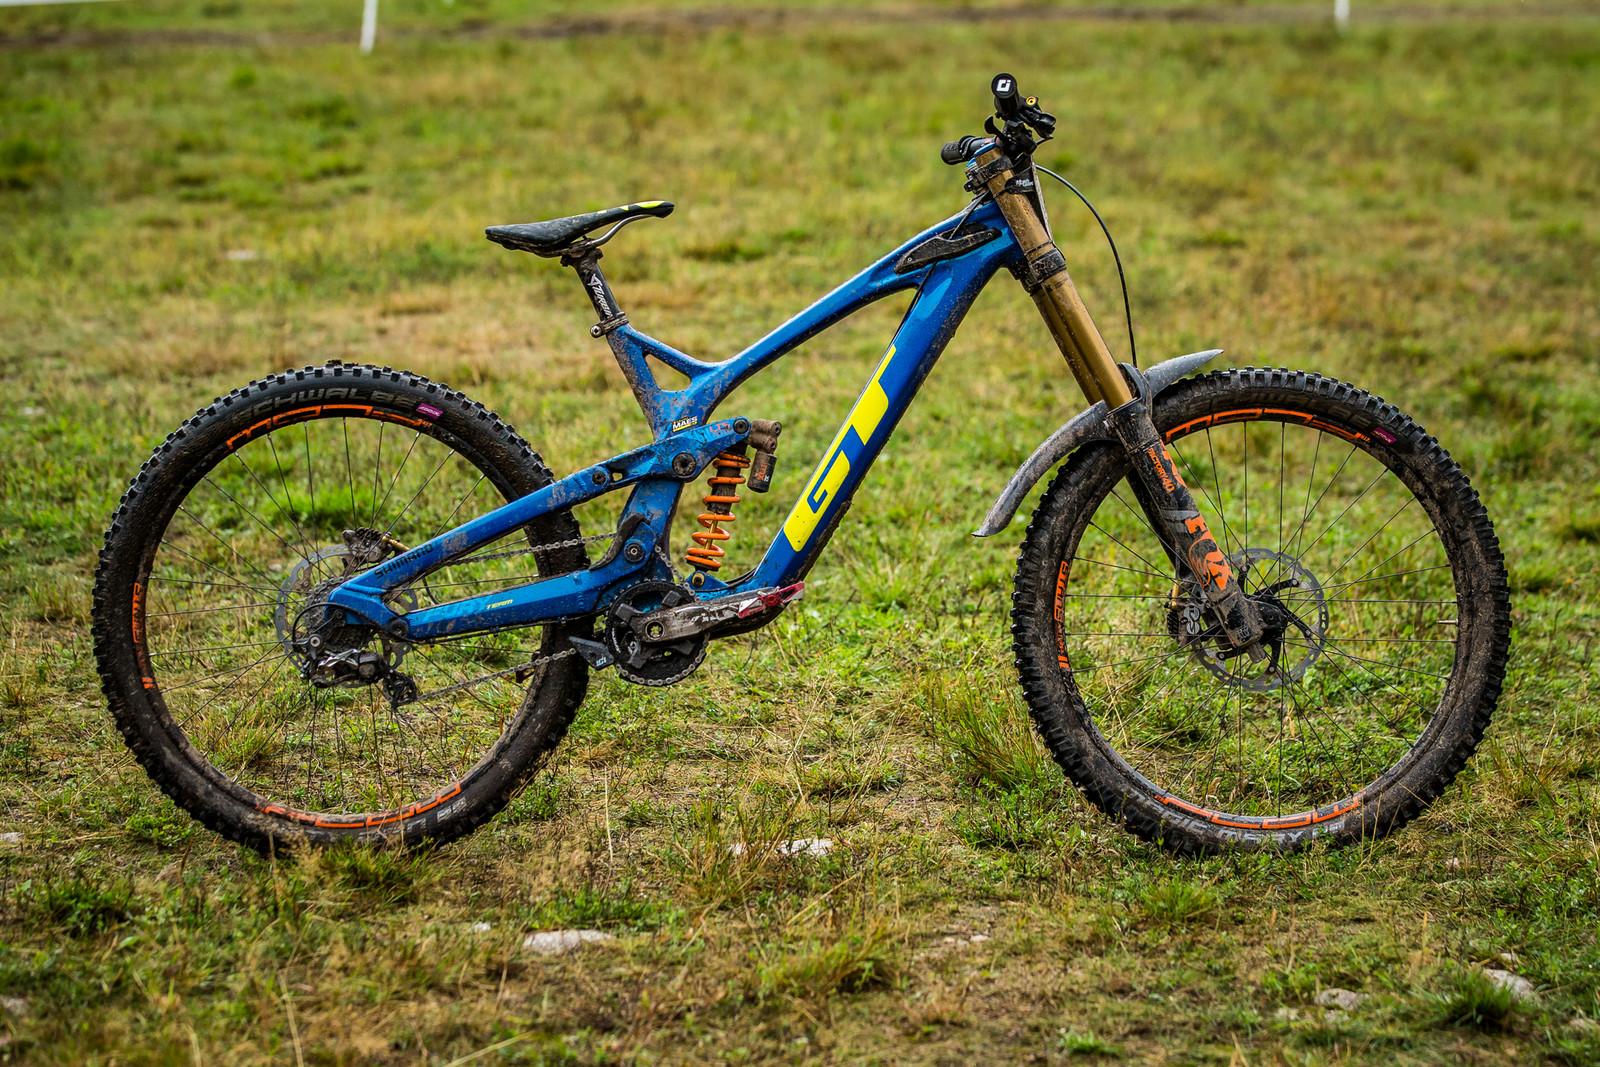 WINNING BIKE - Martin Maes' GT Fury - WINNING BIKE - Martin Maes' GT Fury - Mountain Biking Pictures - Vital MTB